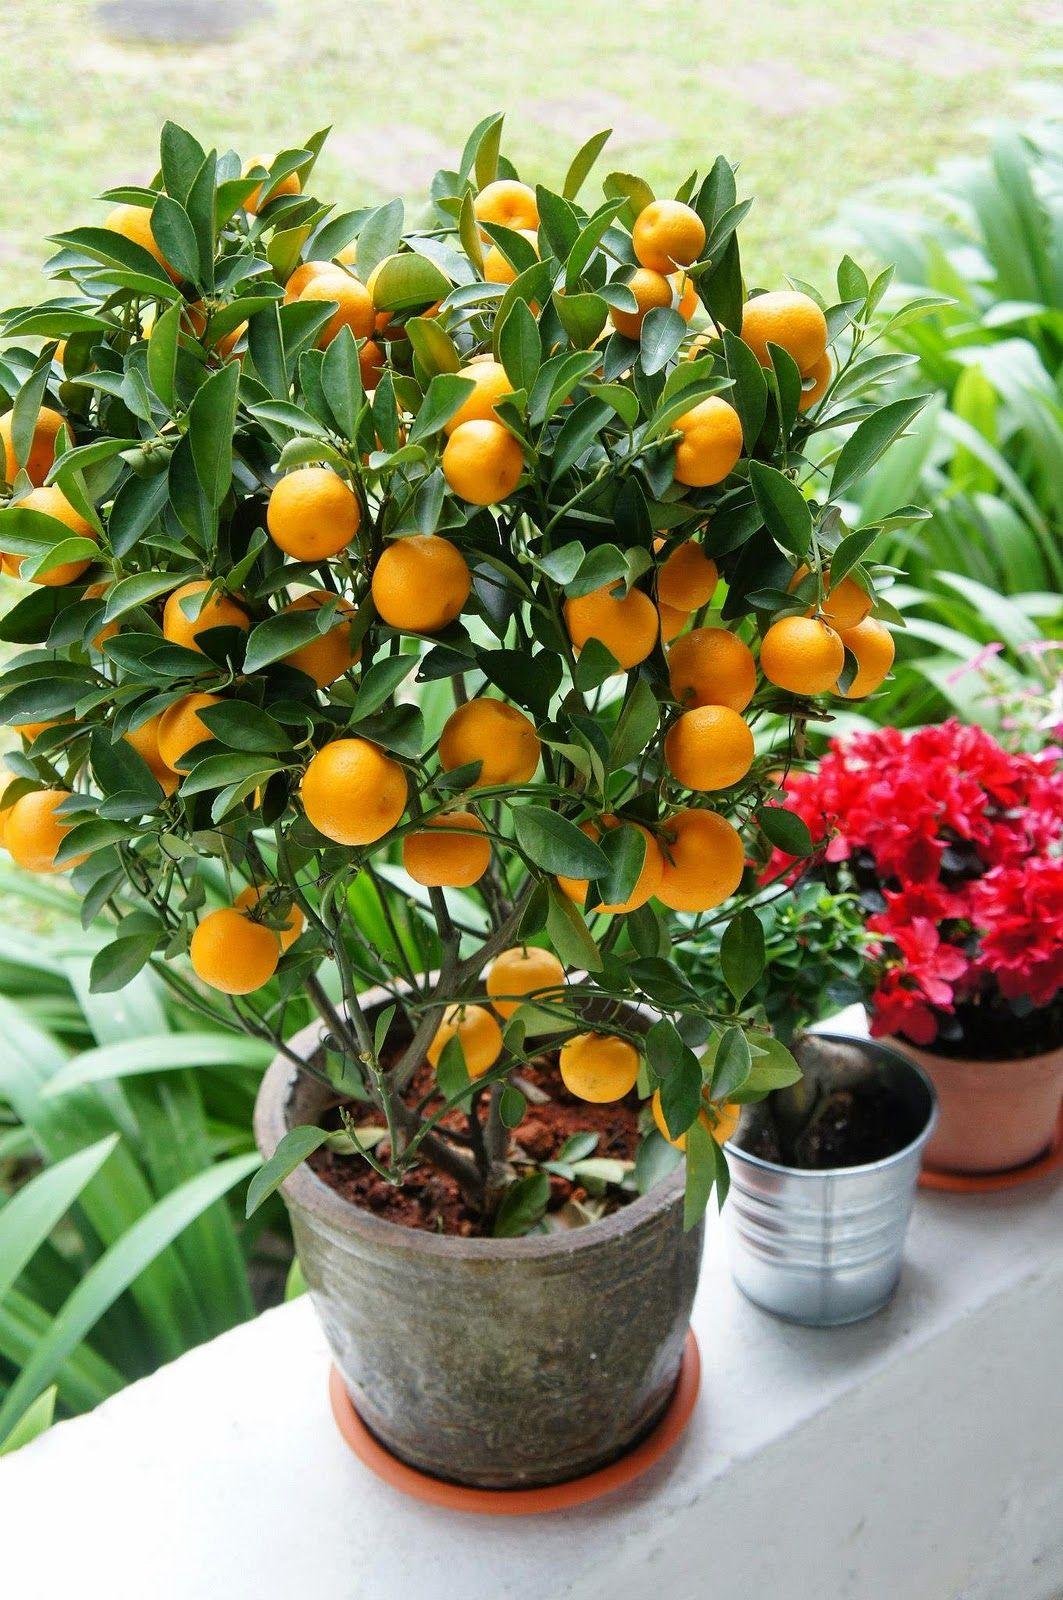 Laranja Kinkan Para Bodas De Flores E Frutas Arvores Frutiferas Sementes De Arvores Bananeiras